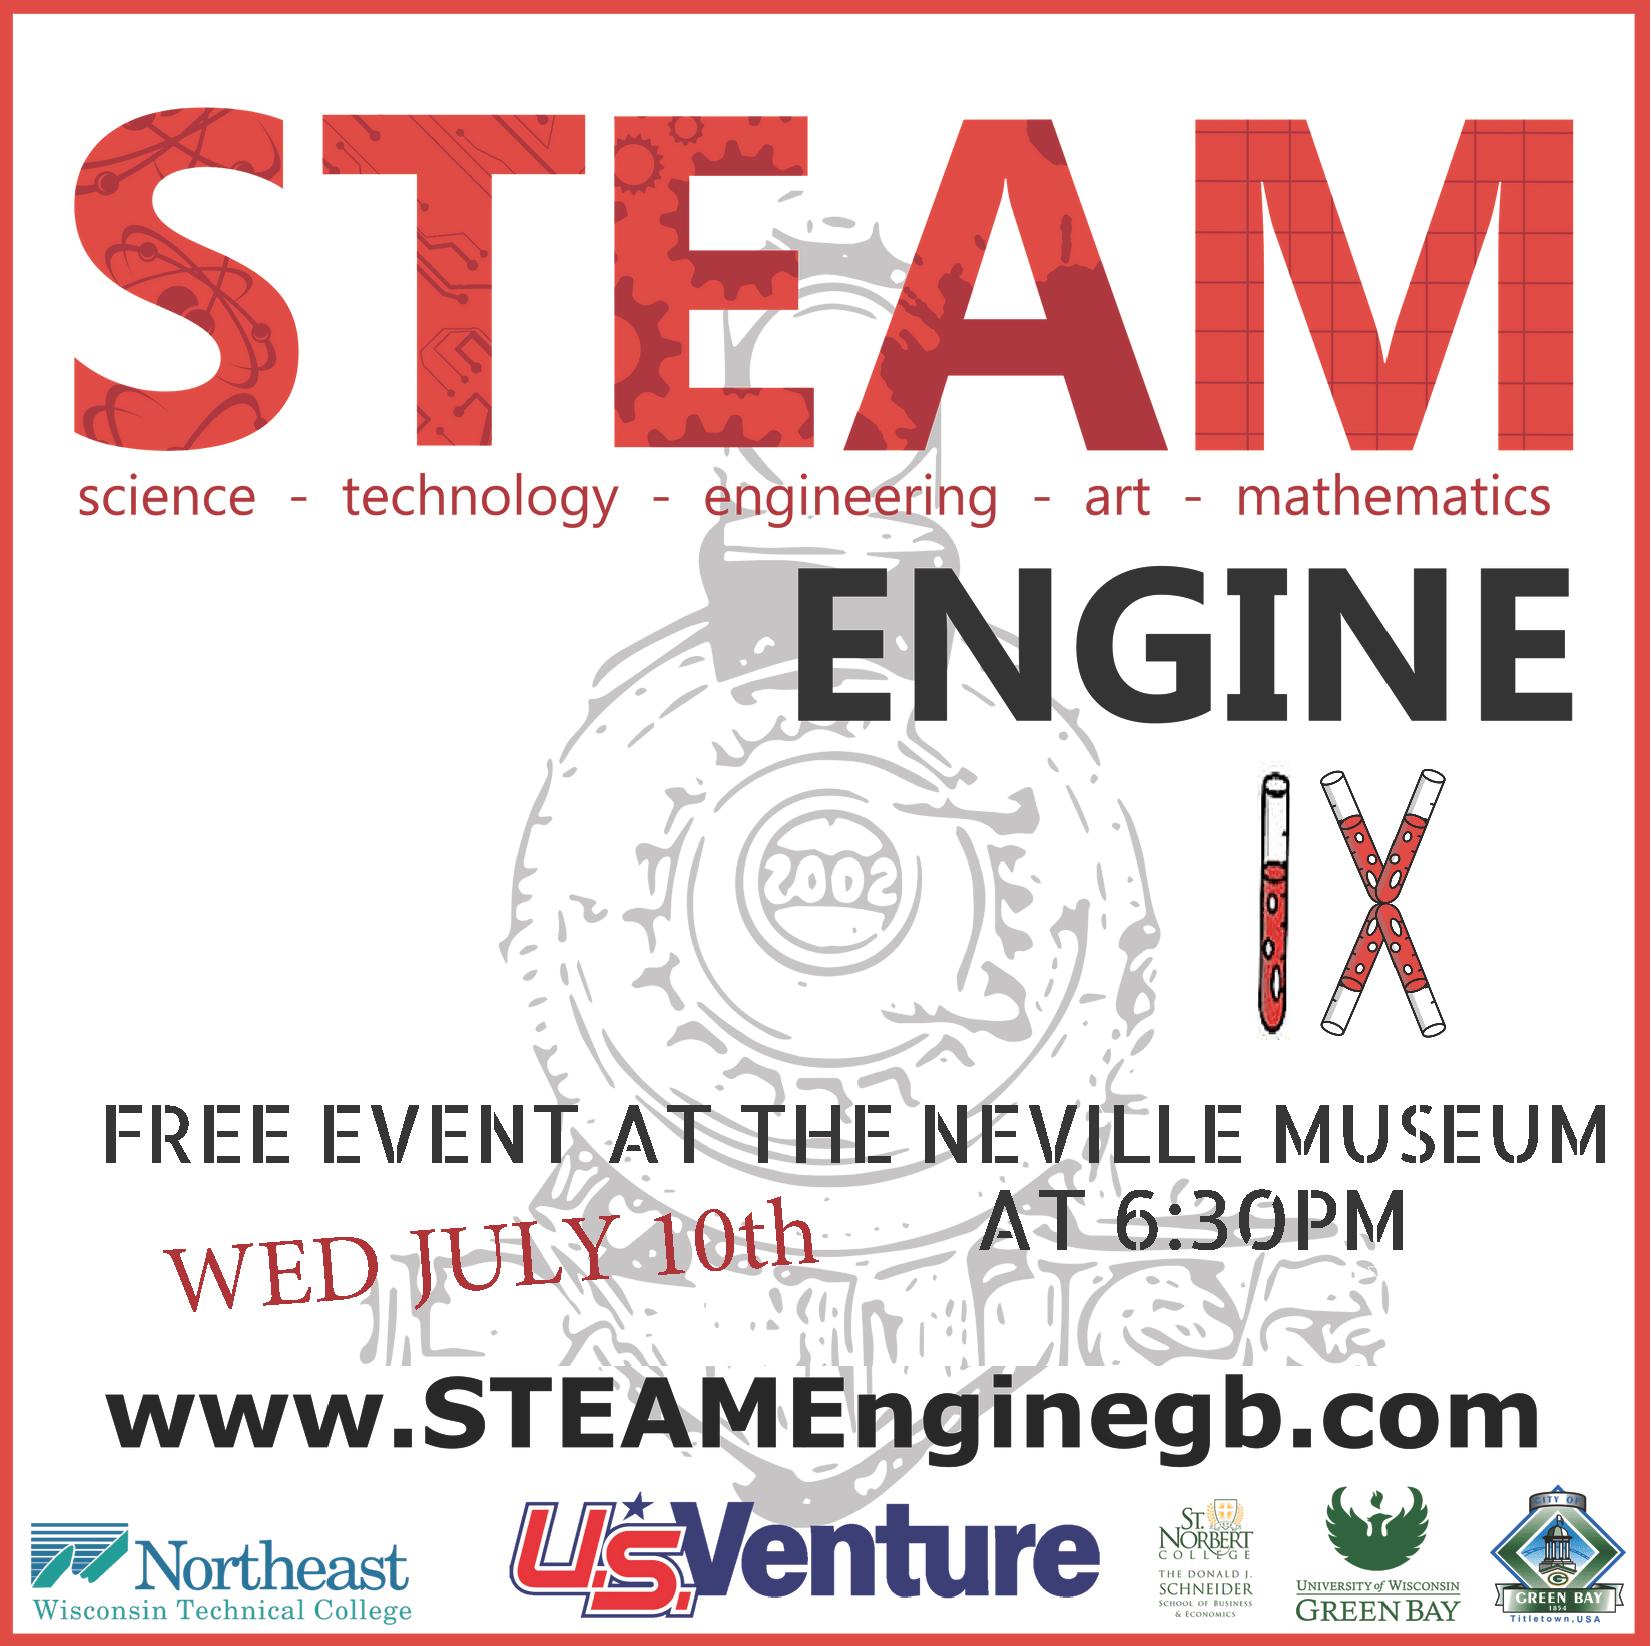 STEAM Engine IX art